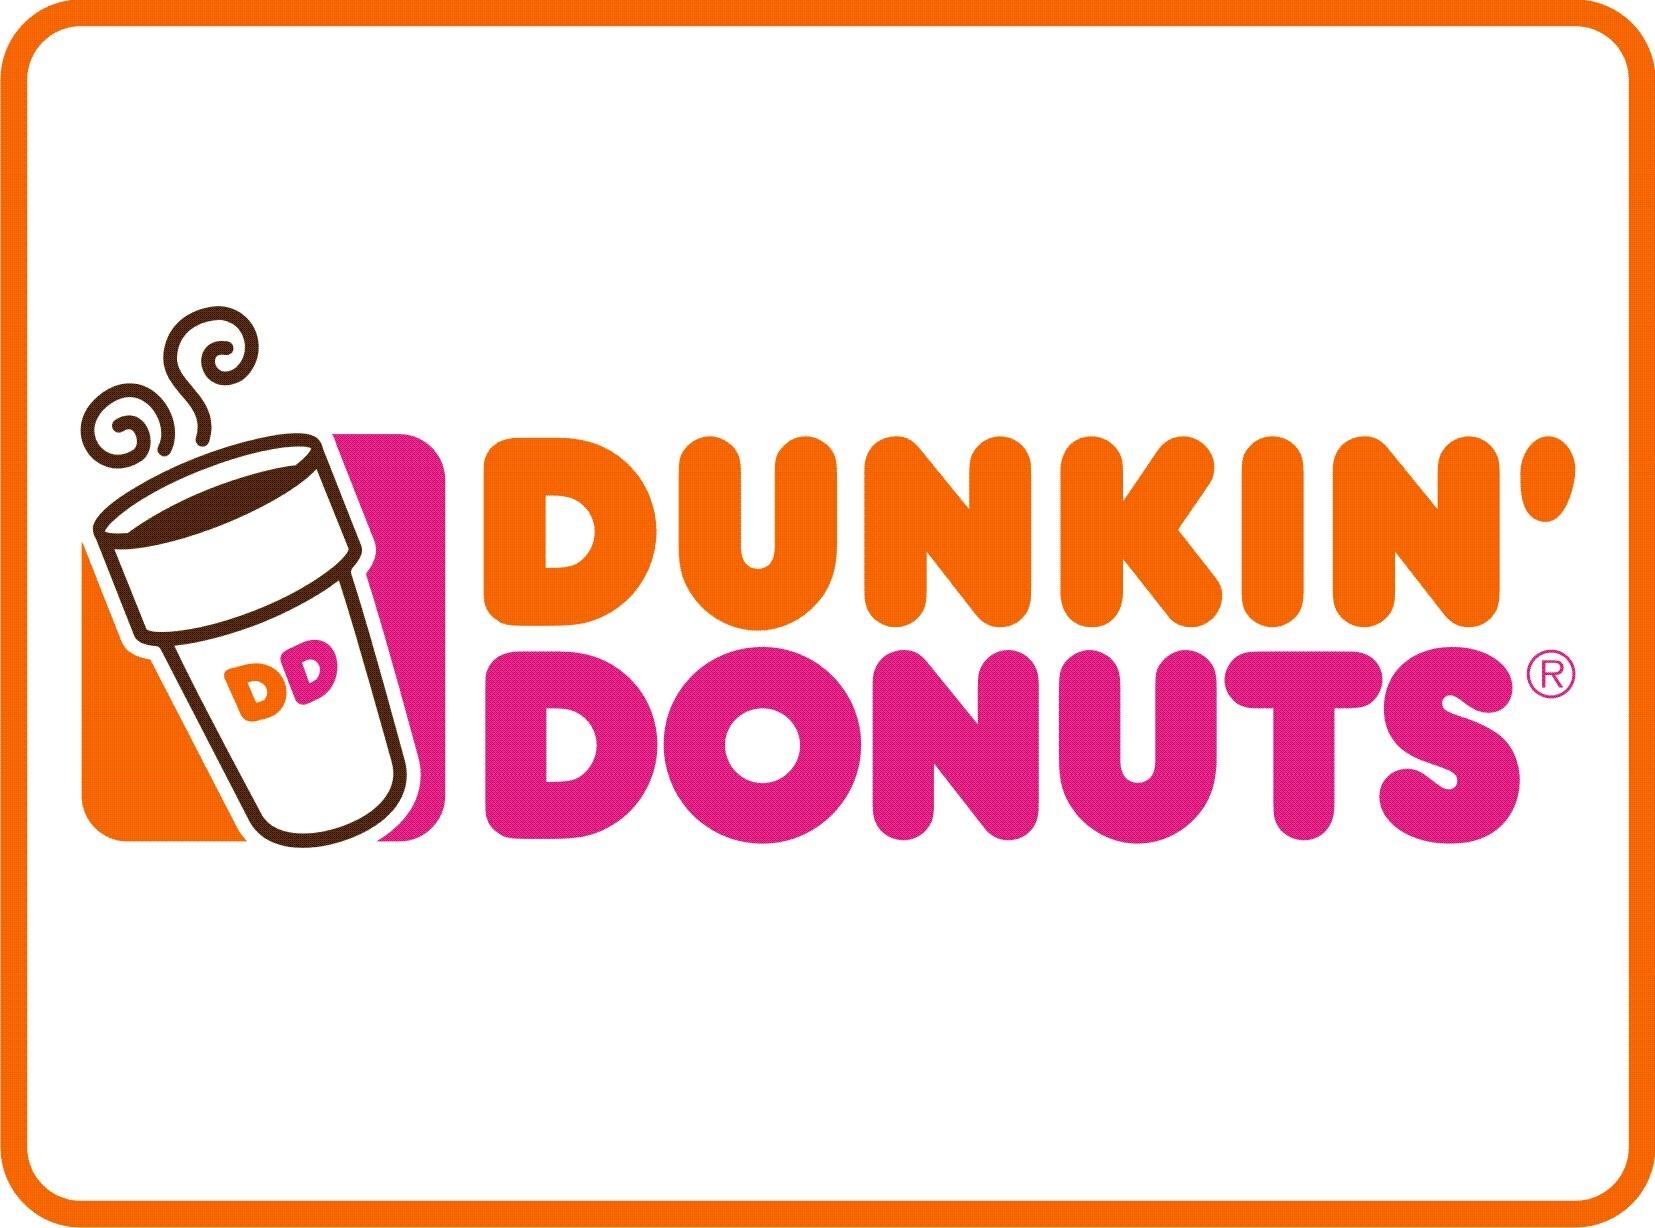 Dunkin Donuts clipart #6